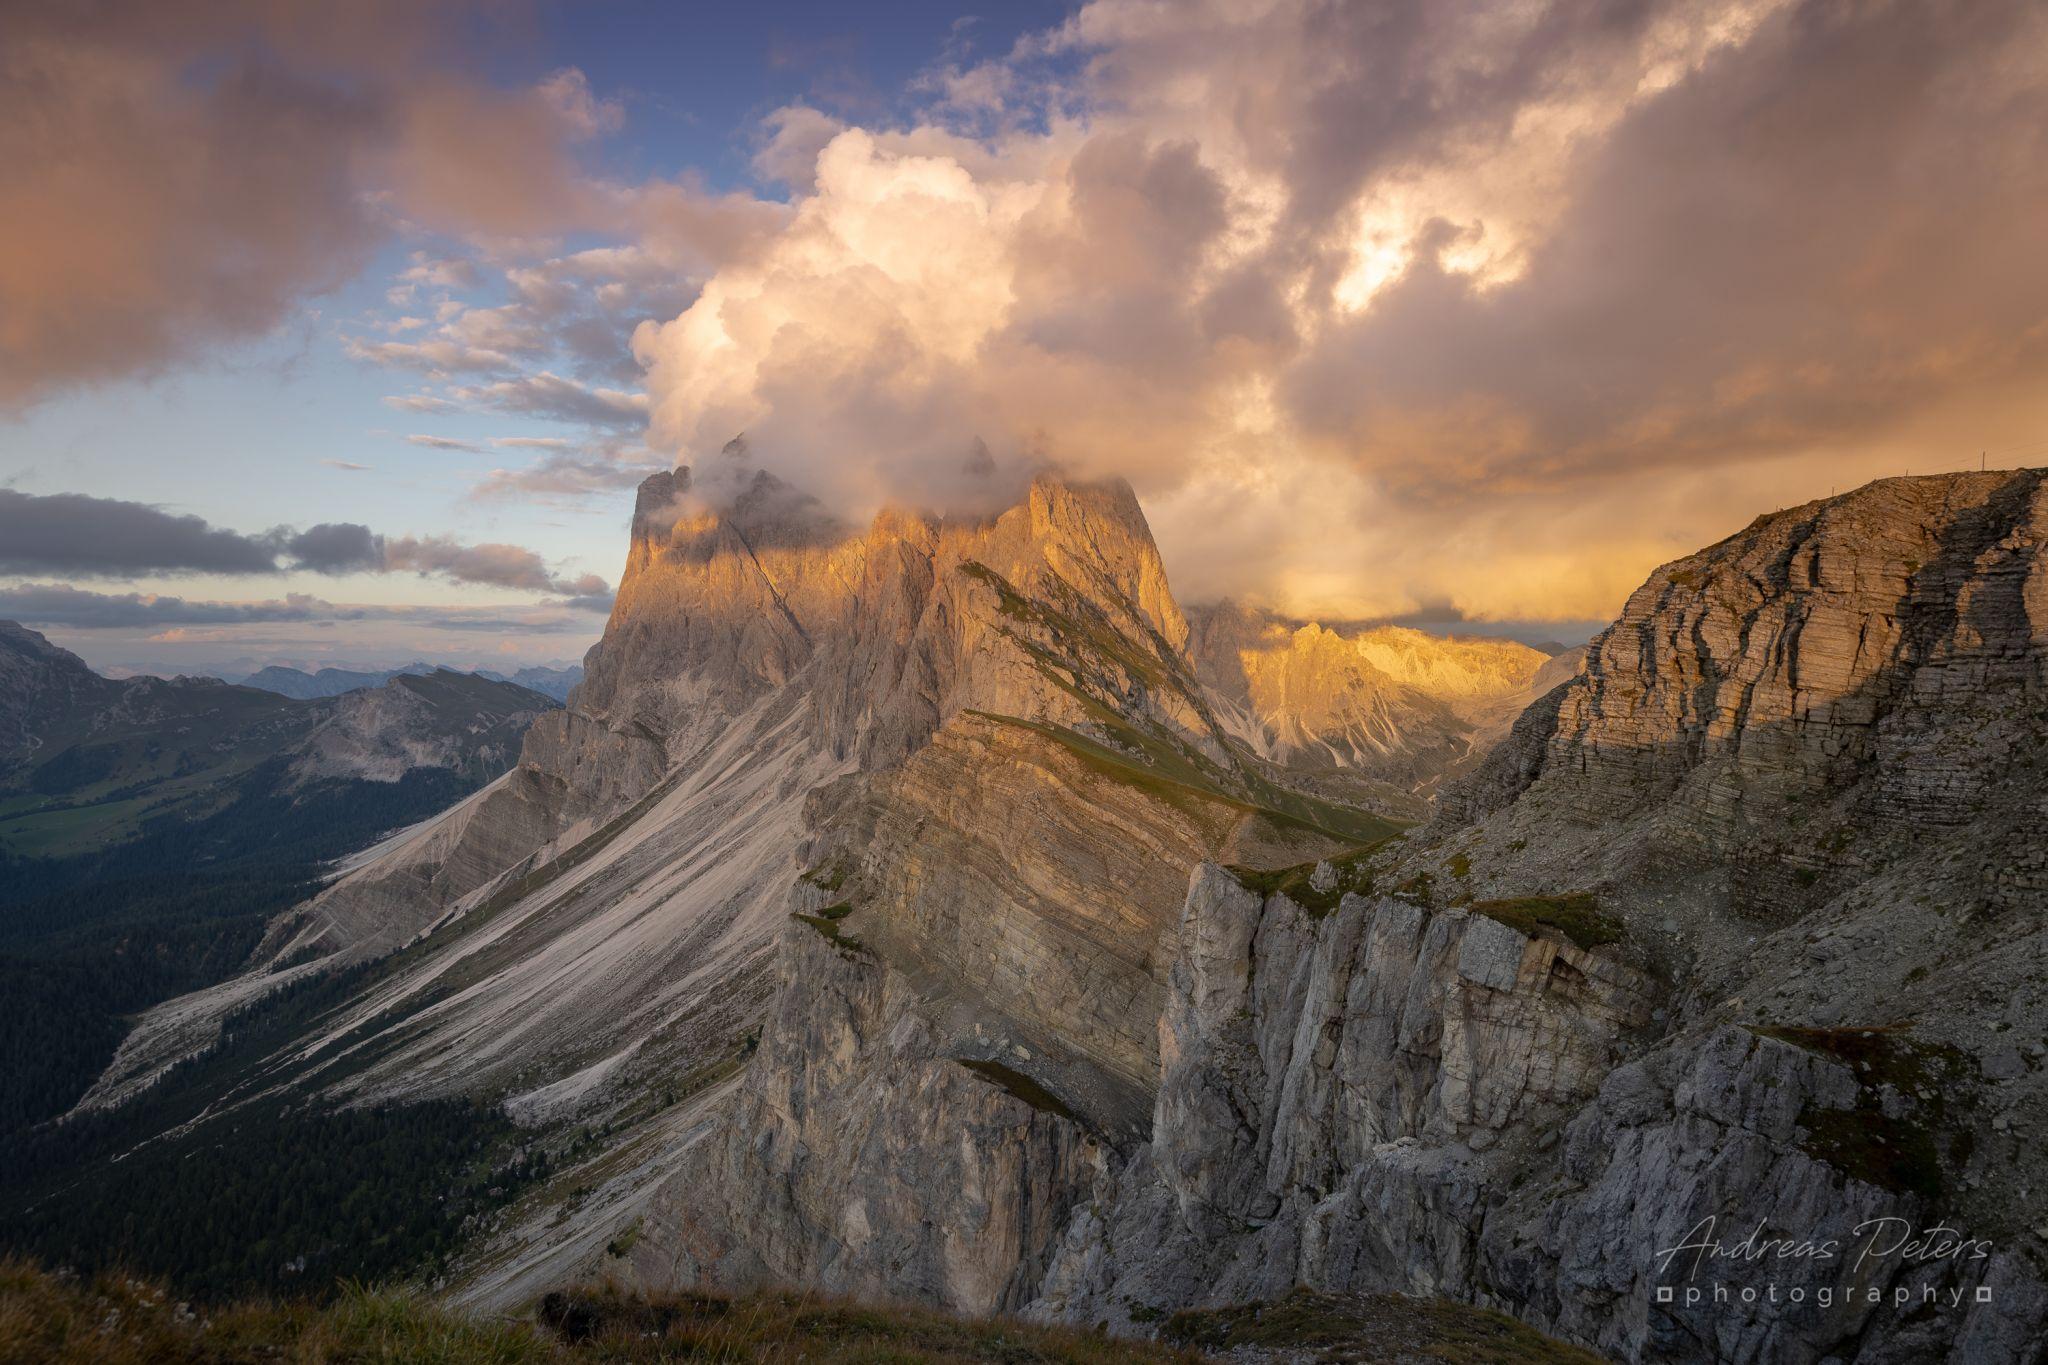 Seceda (2500m), Dolomites, Italy